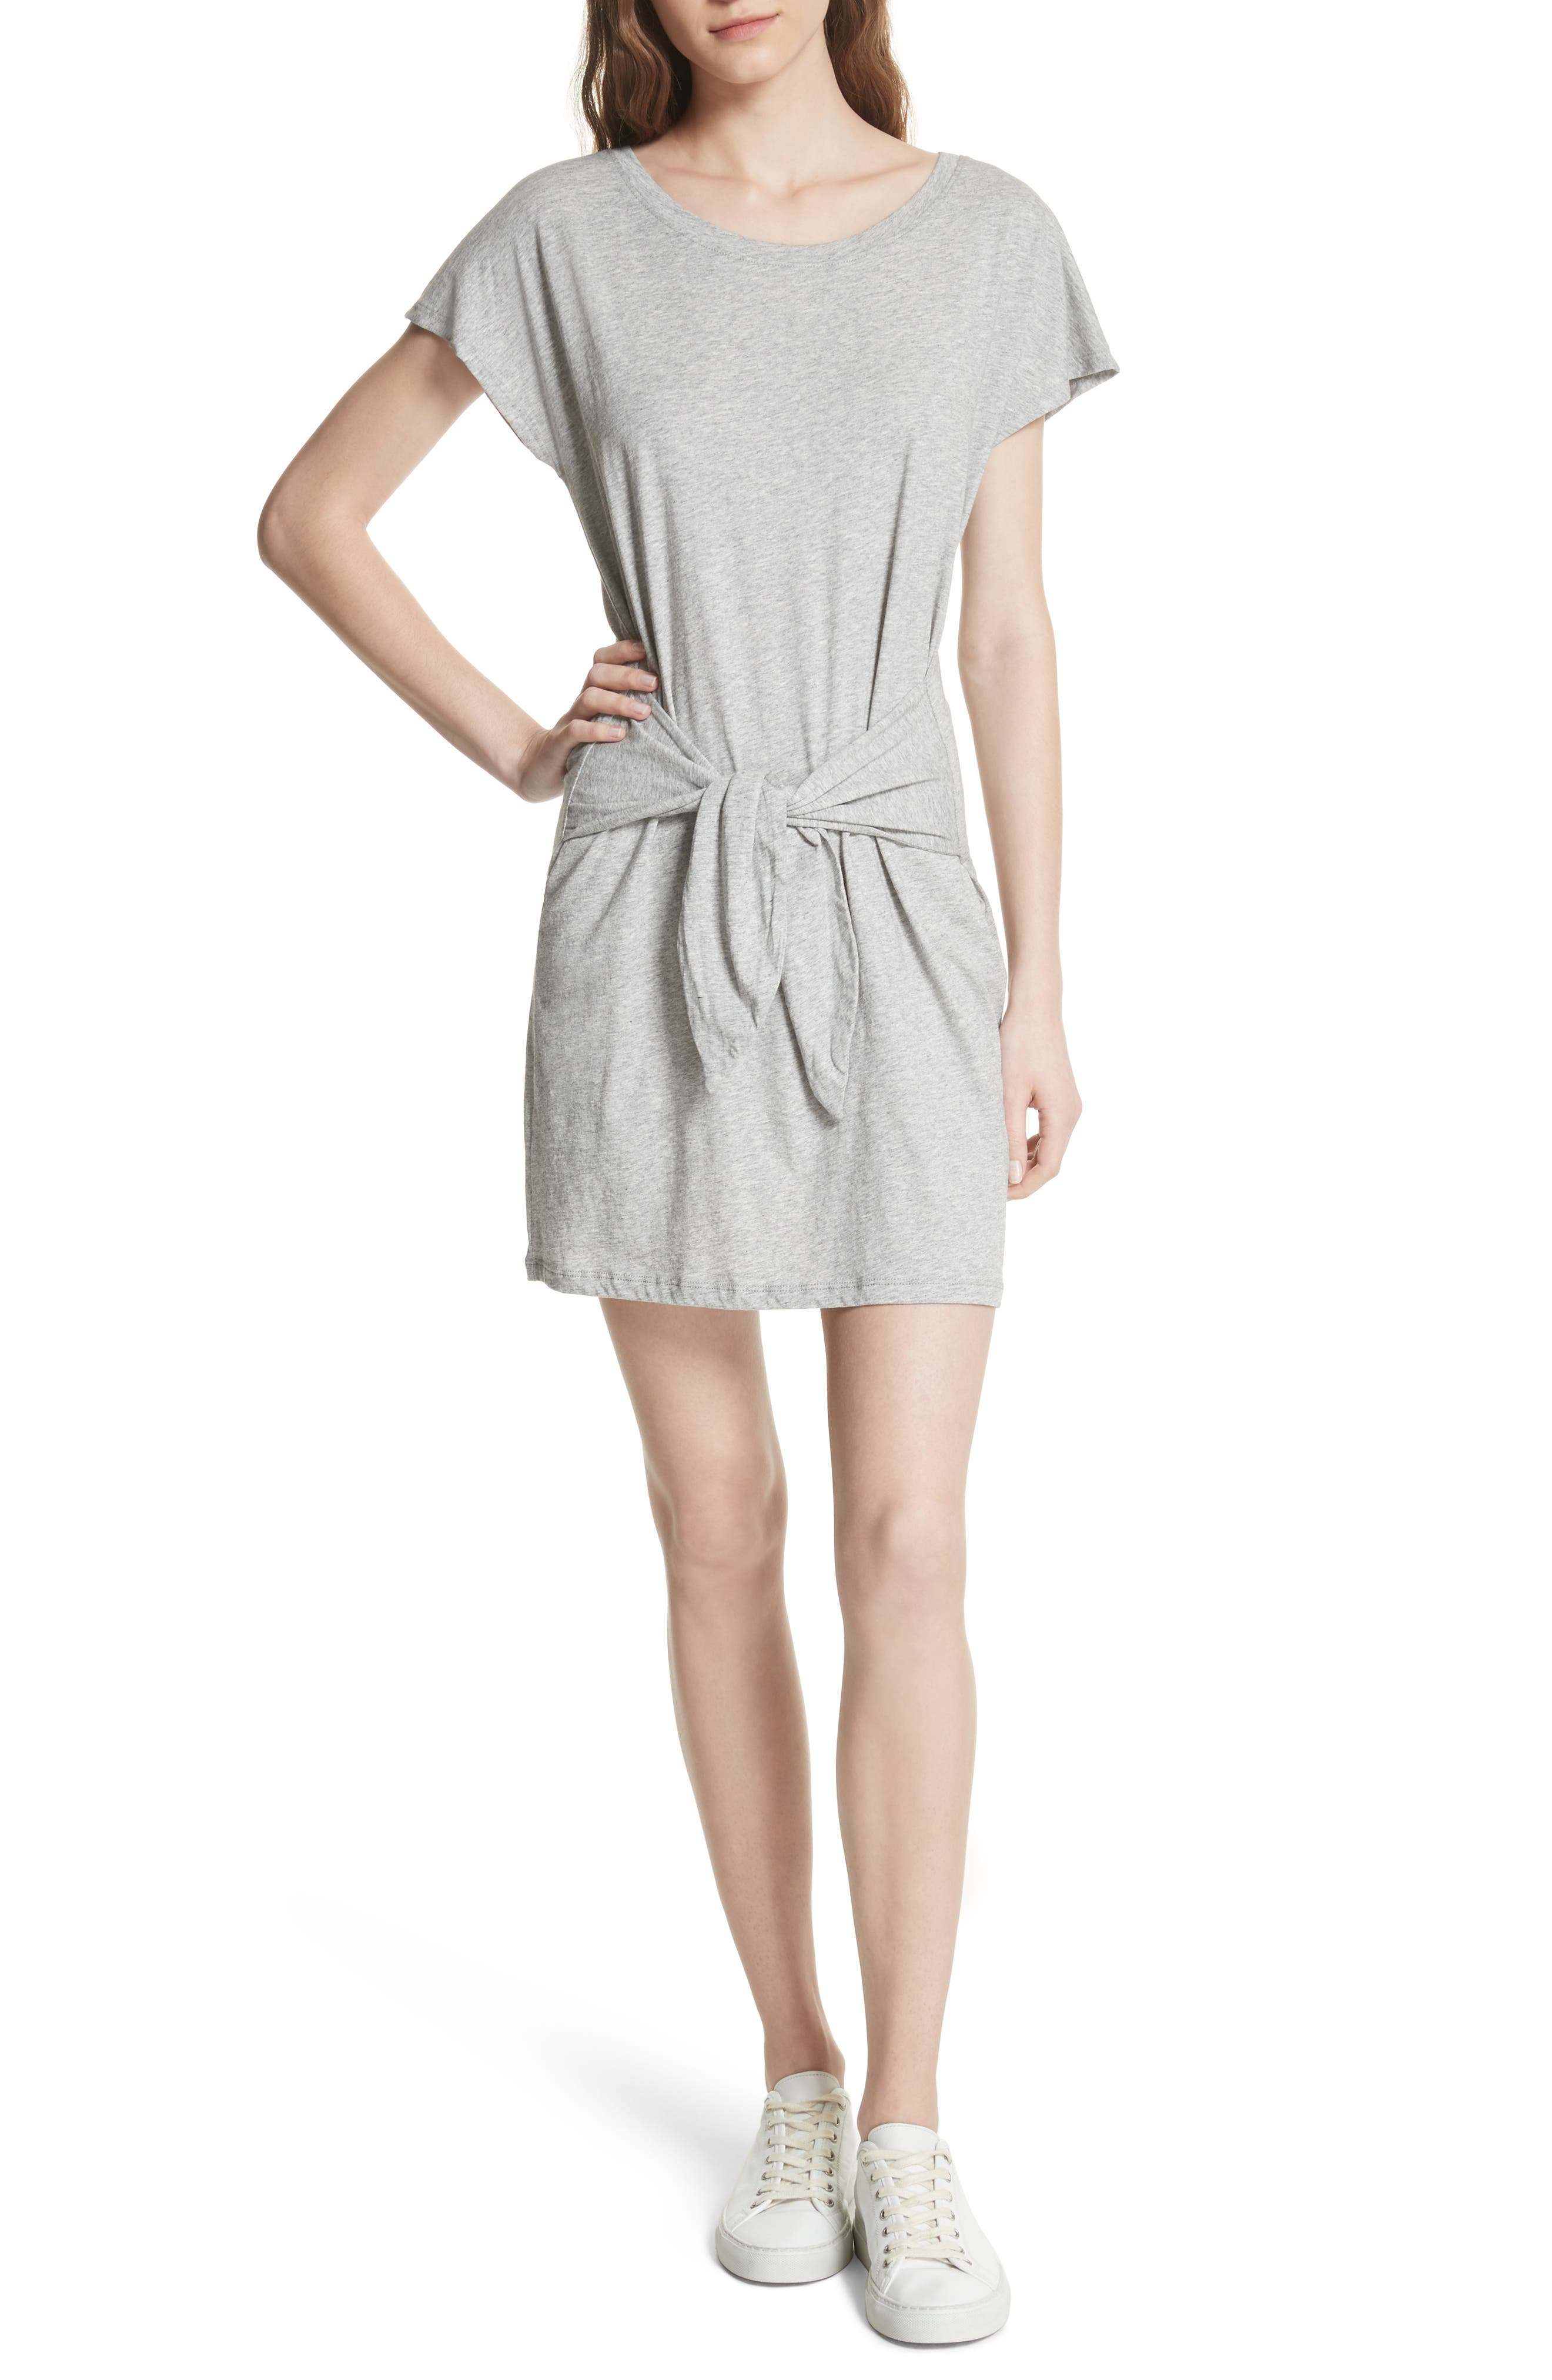 Alyra Tie Waist Cotton T-Shirt Dress,                         Main,                         color, Heather Grey